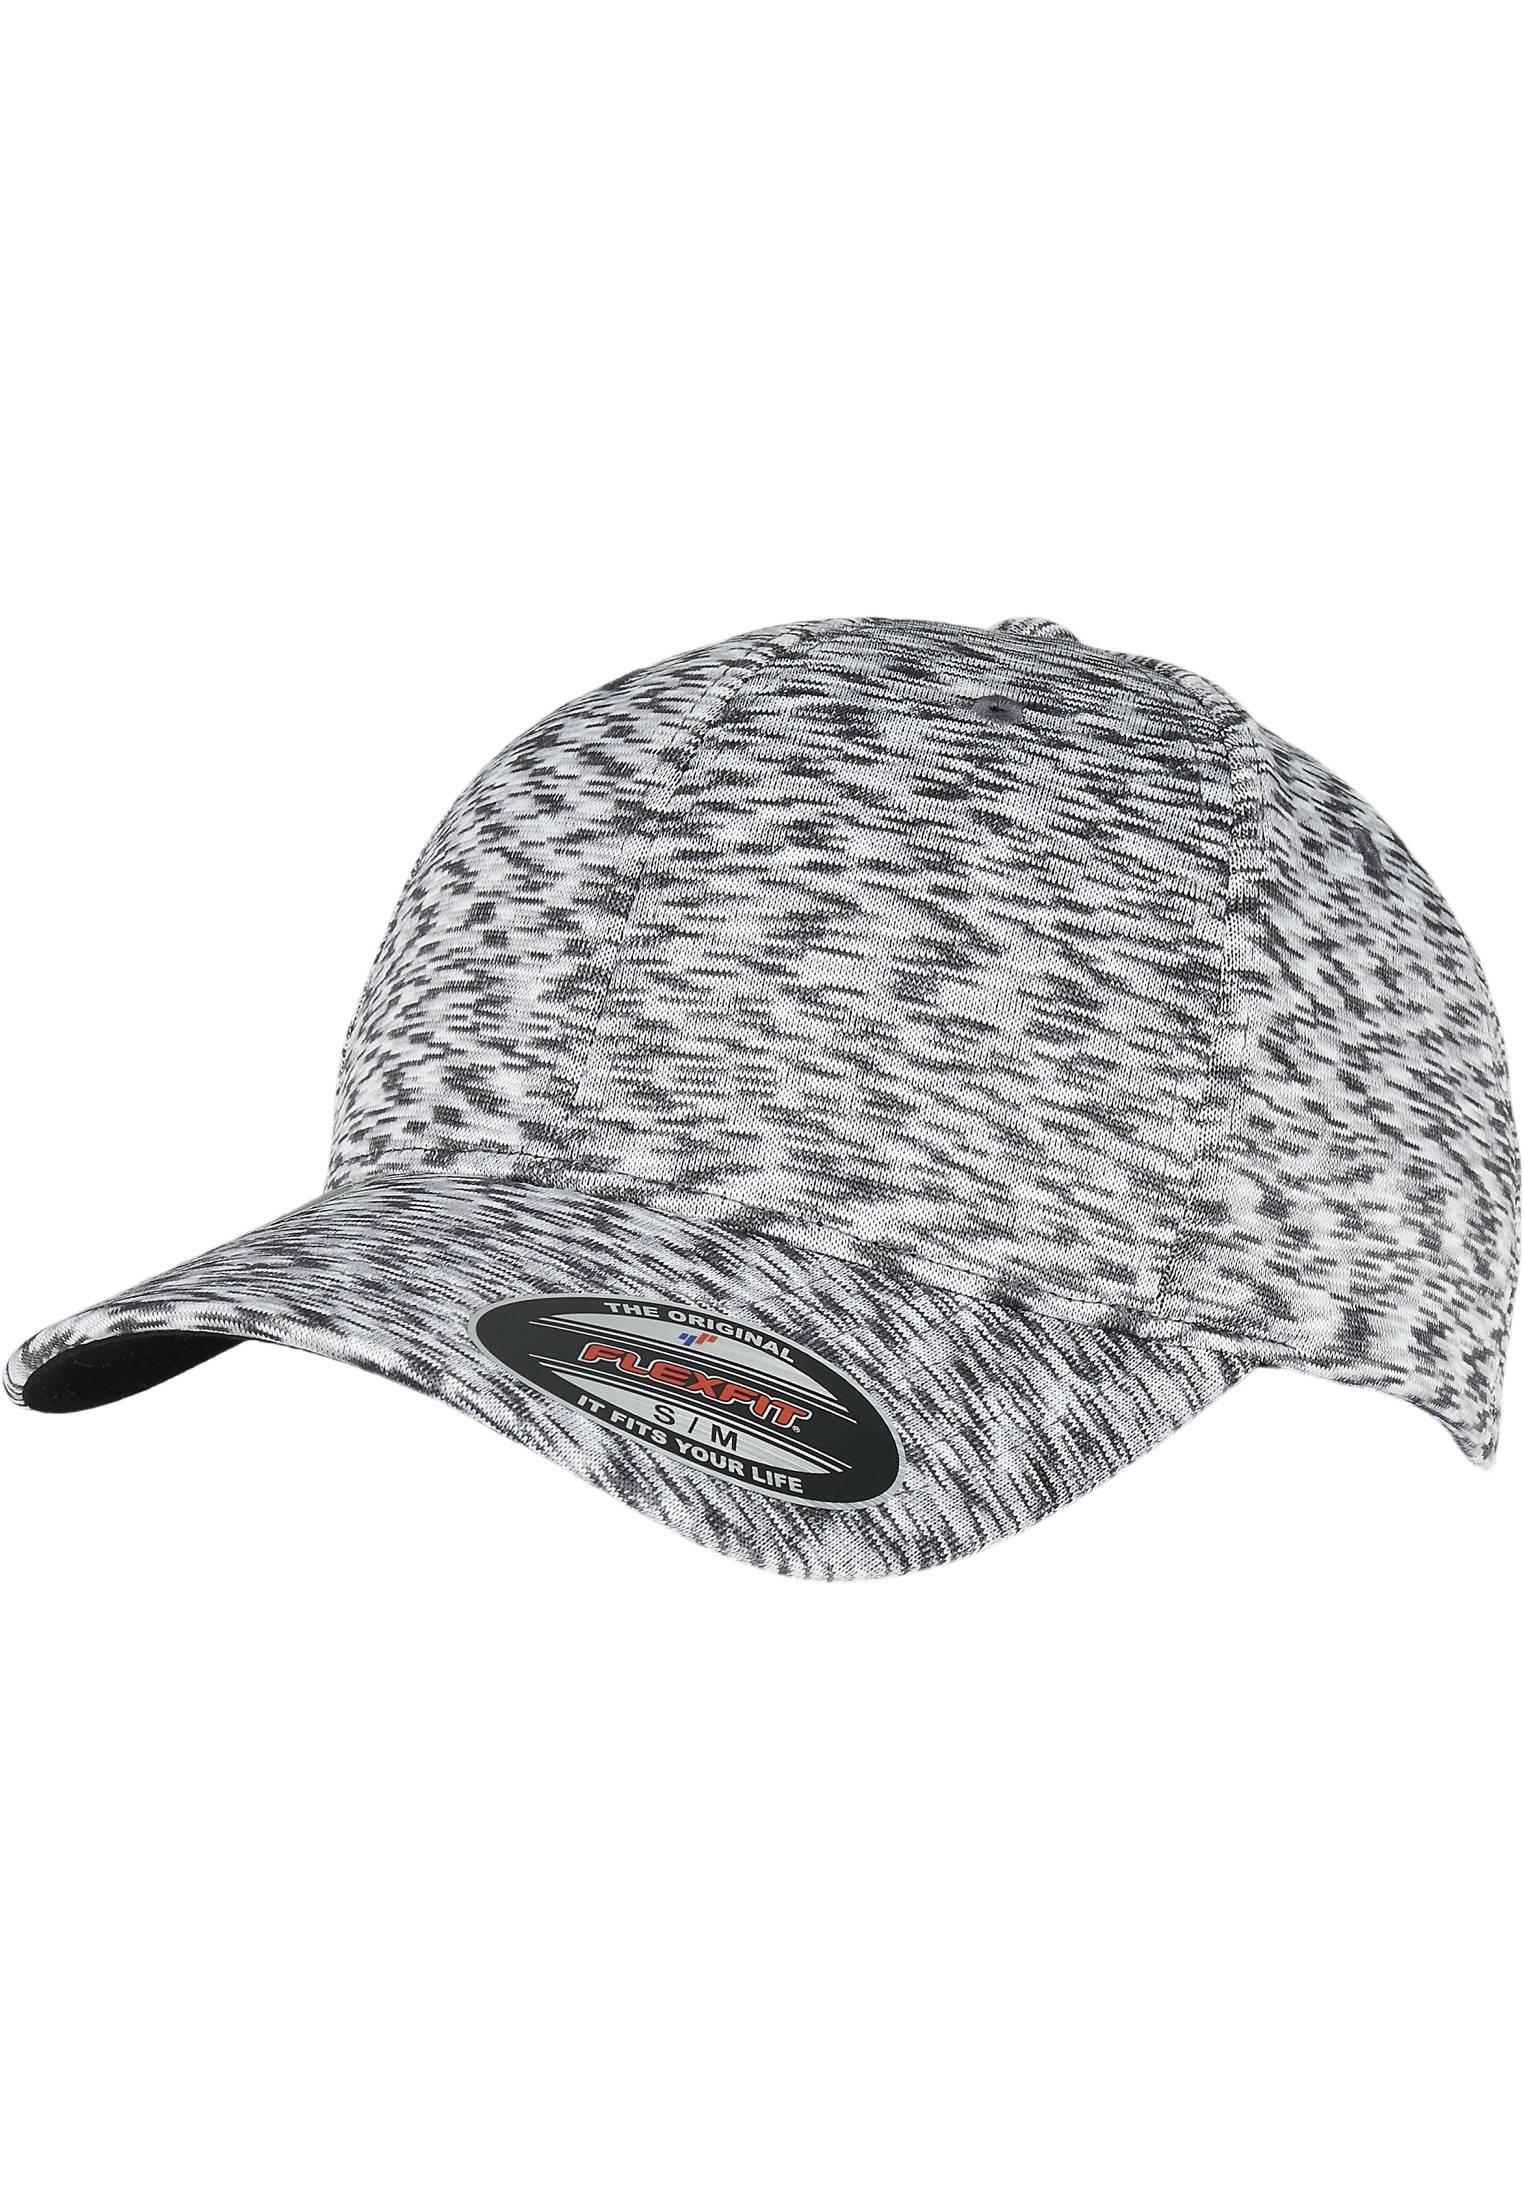 Urban Classics Stripes Melange Flexfit light melange - S/M